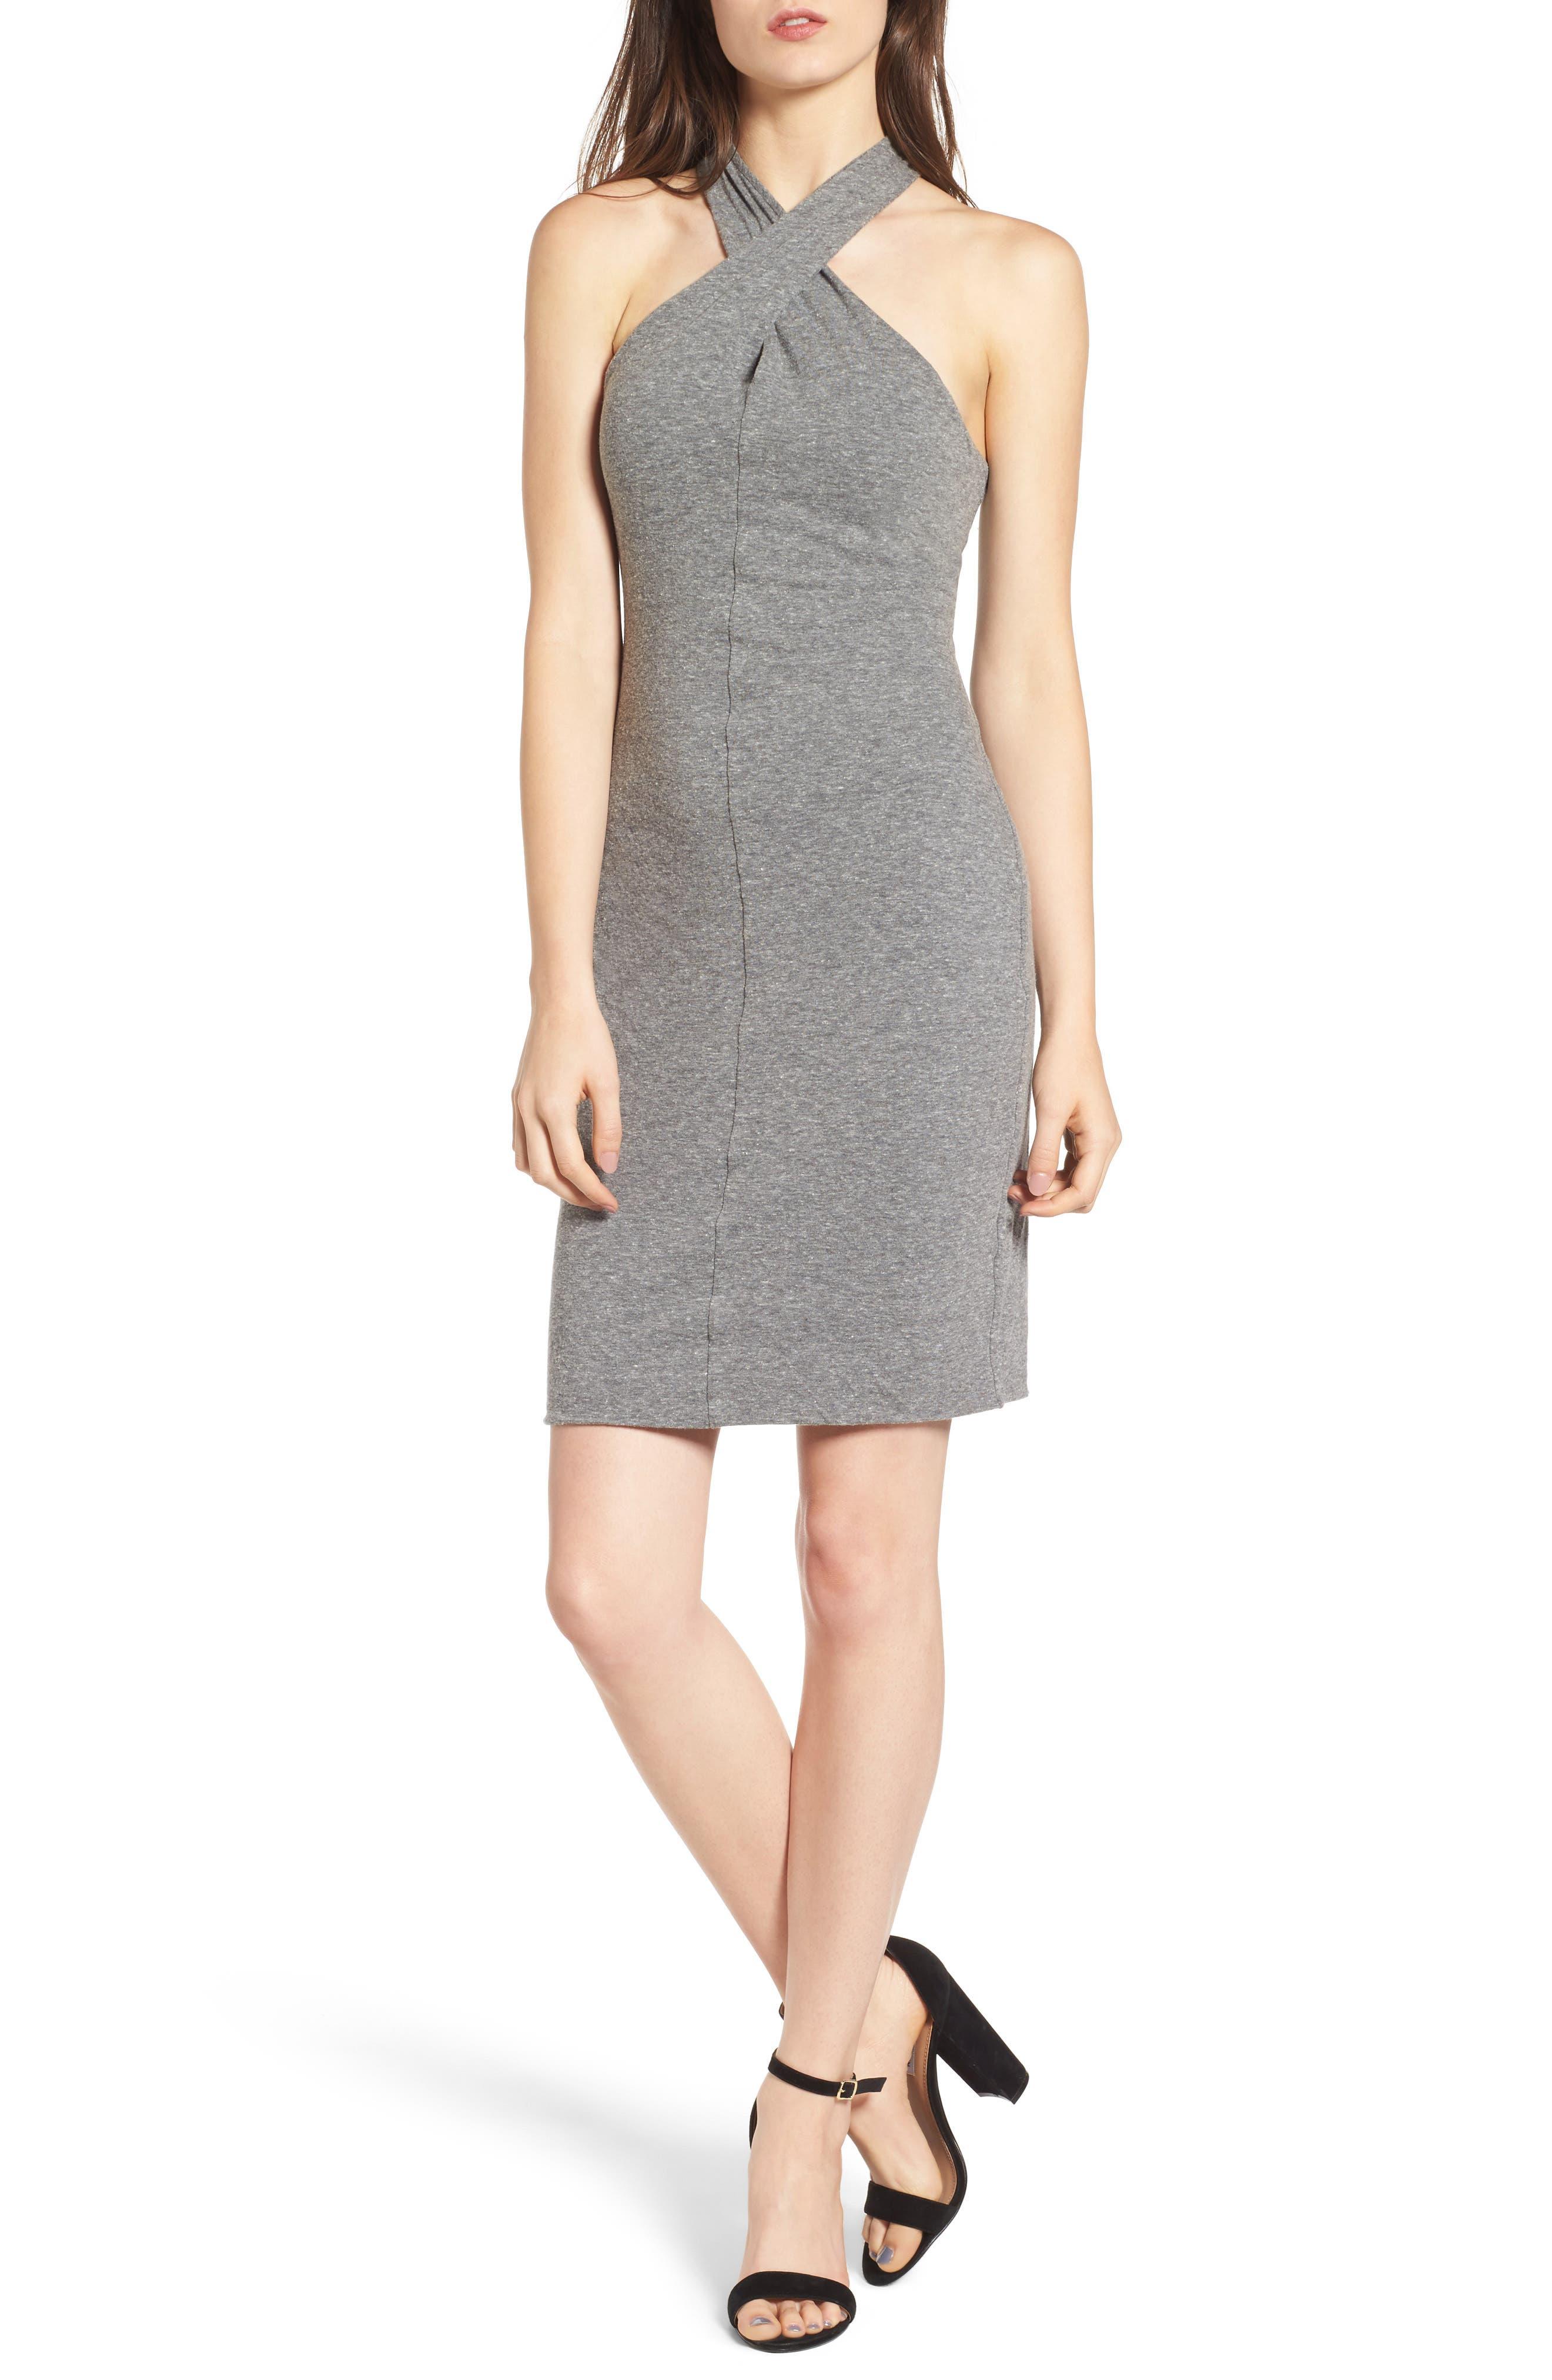 Alternate Image 1 Selected - Pam & Gela Twist Collar Body-Con Dress